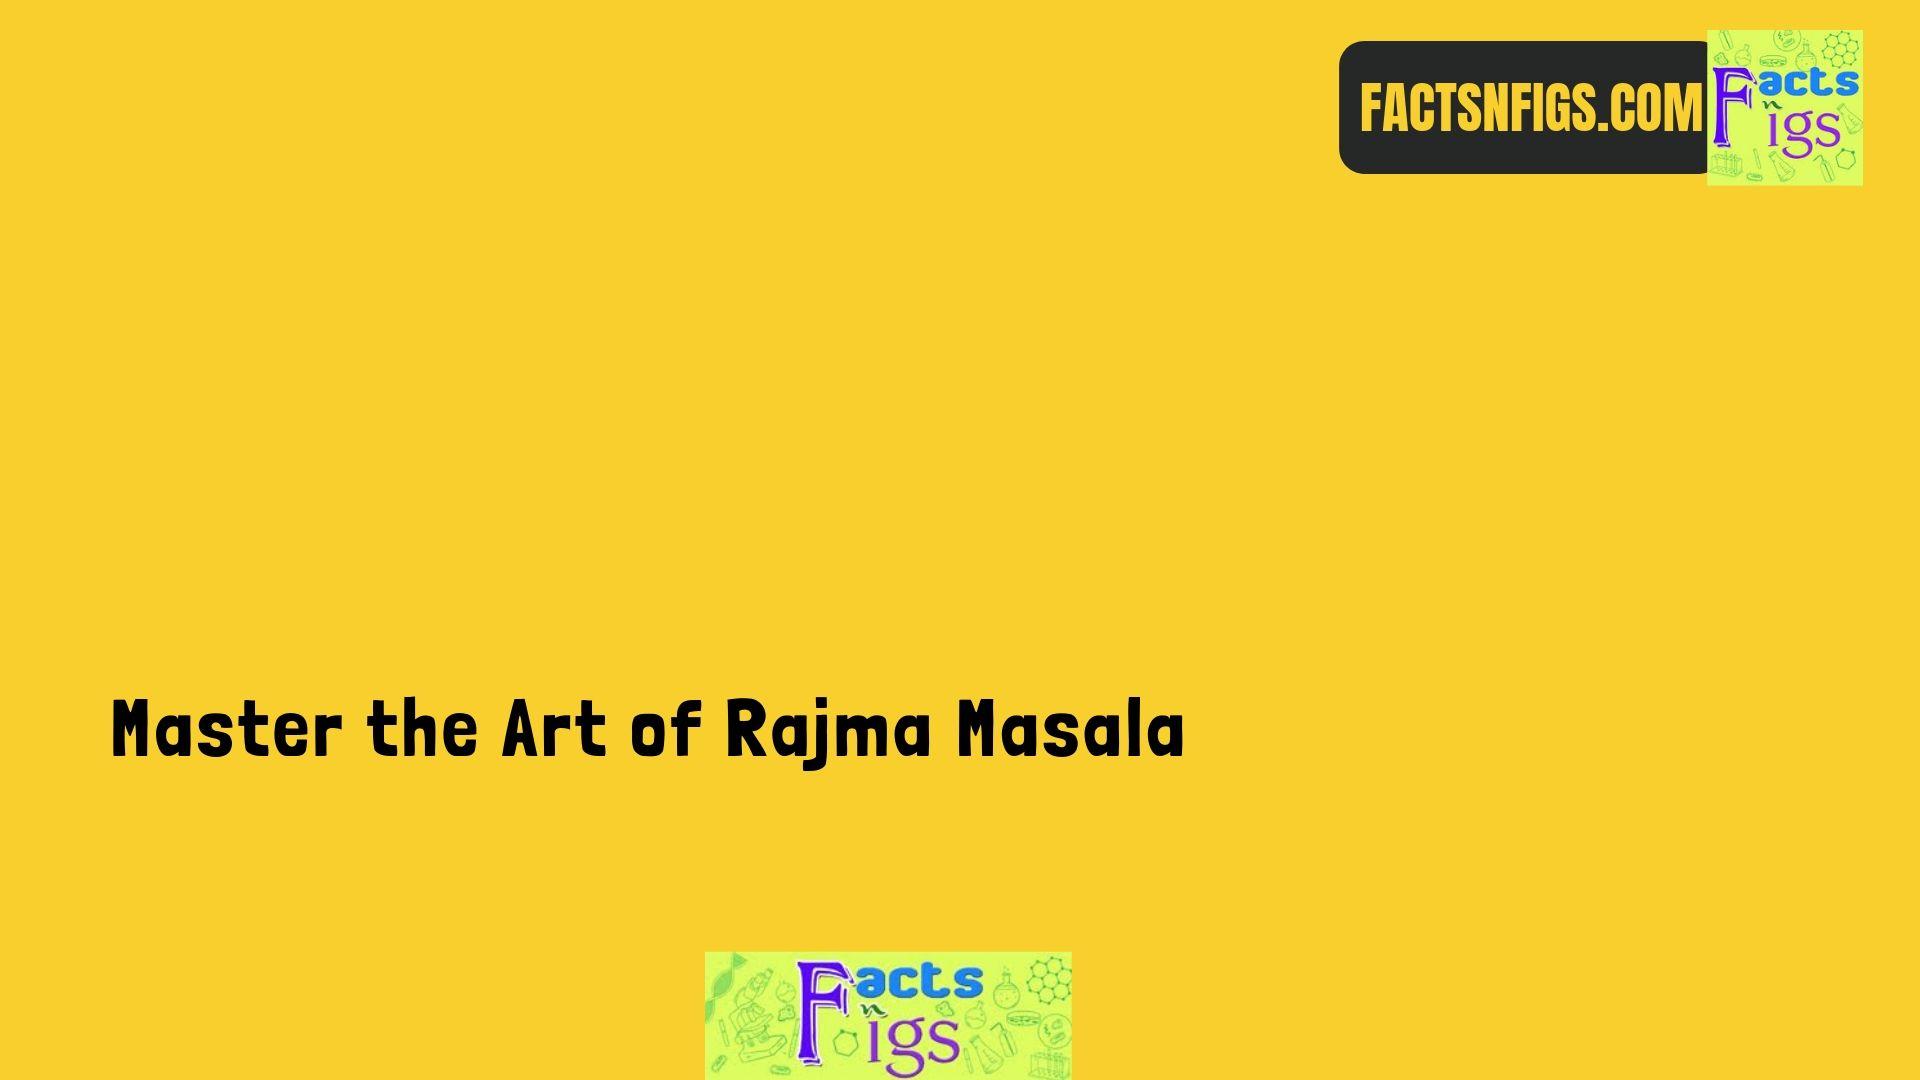 Master the Art of Rajma Masala